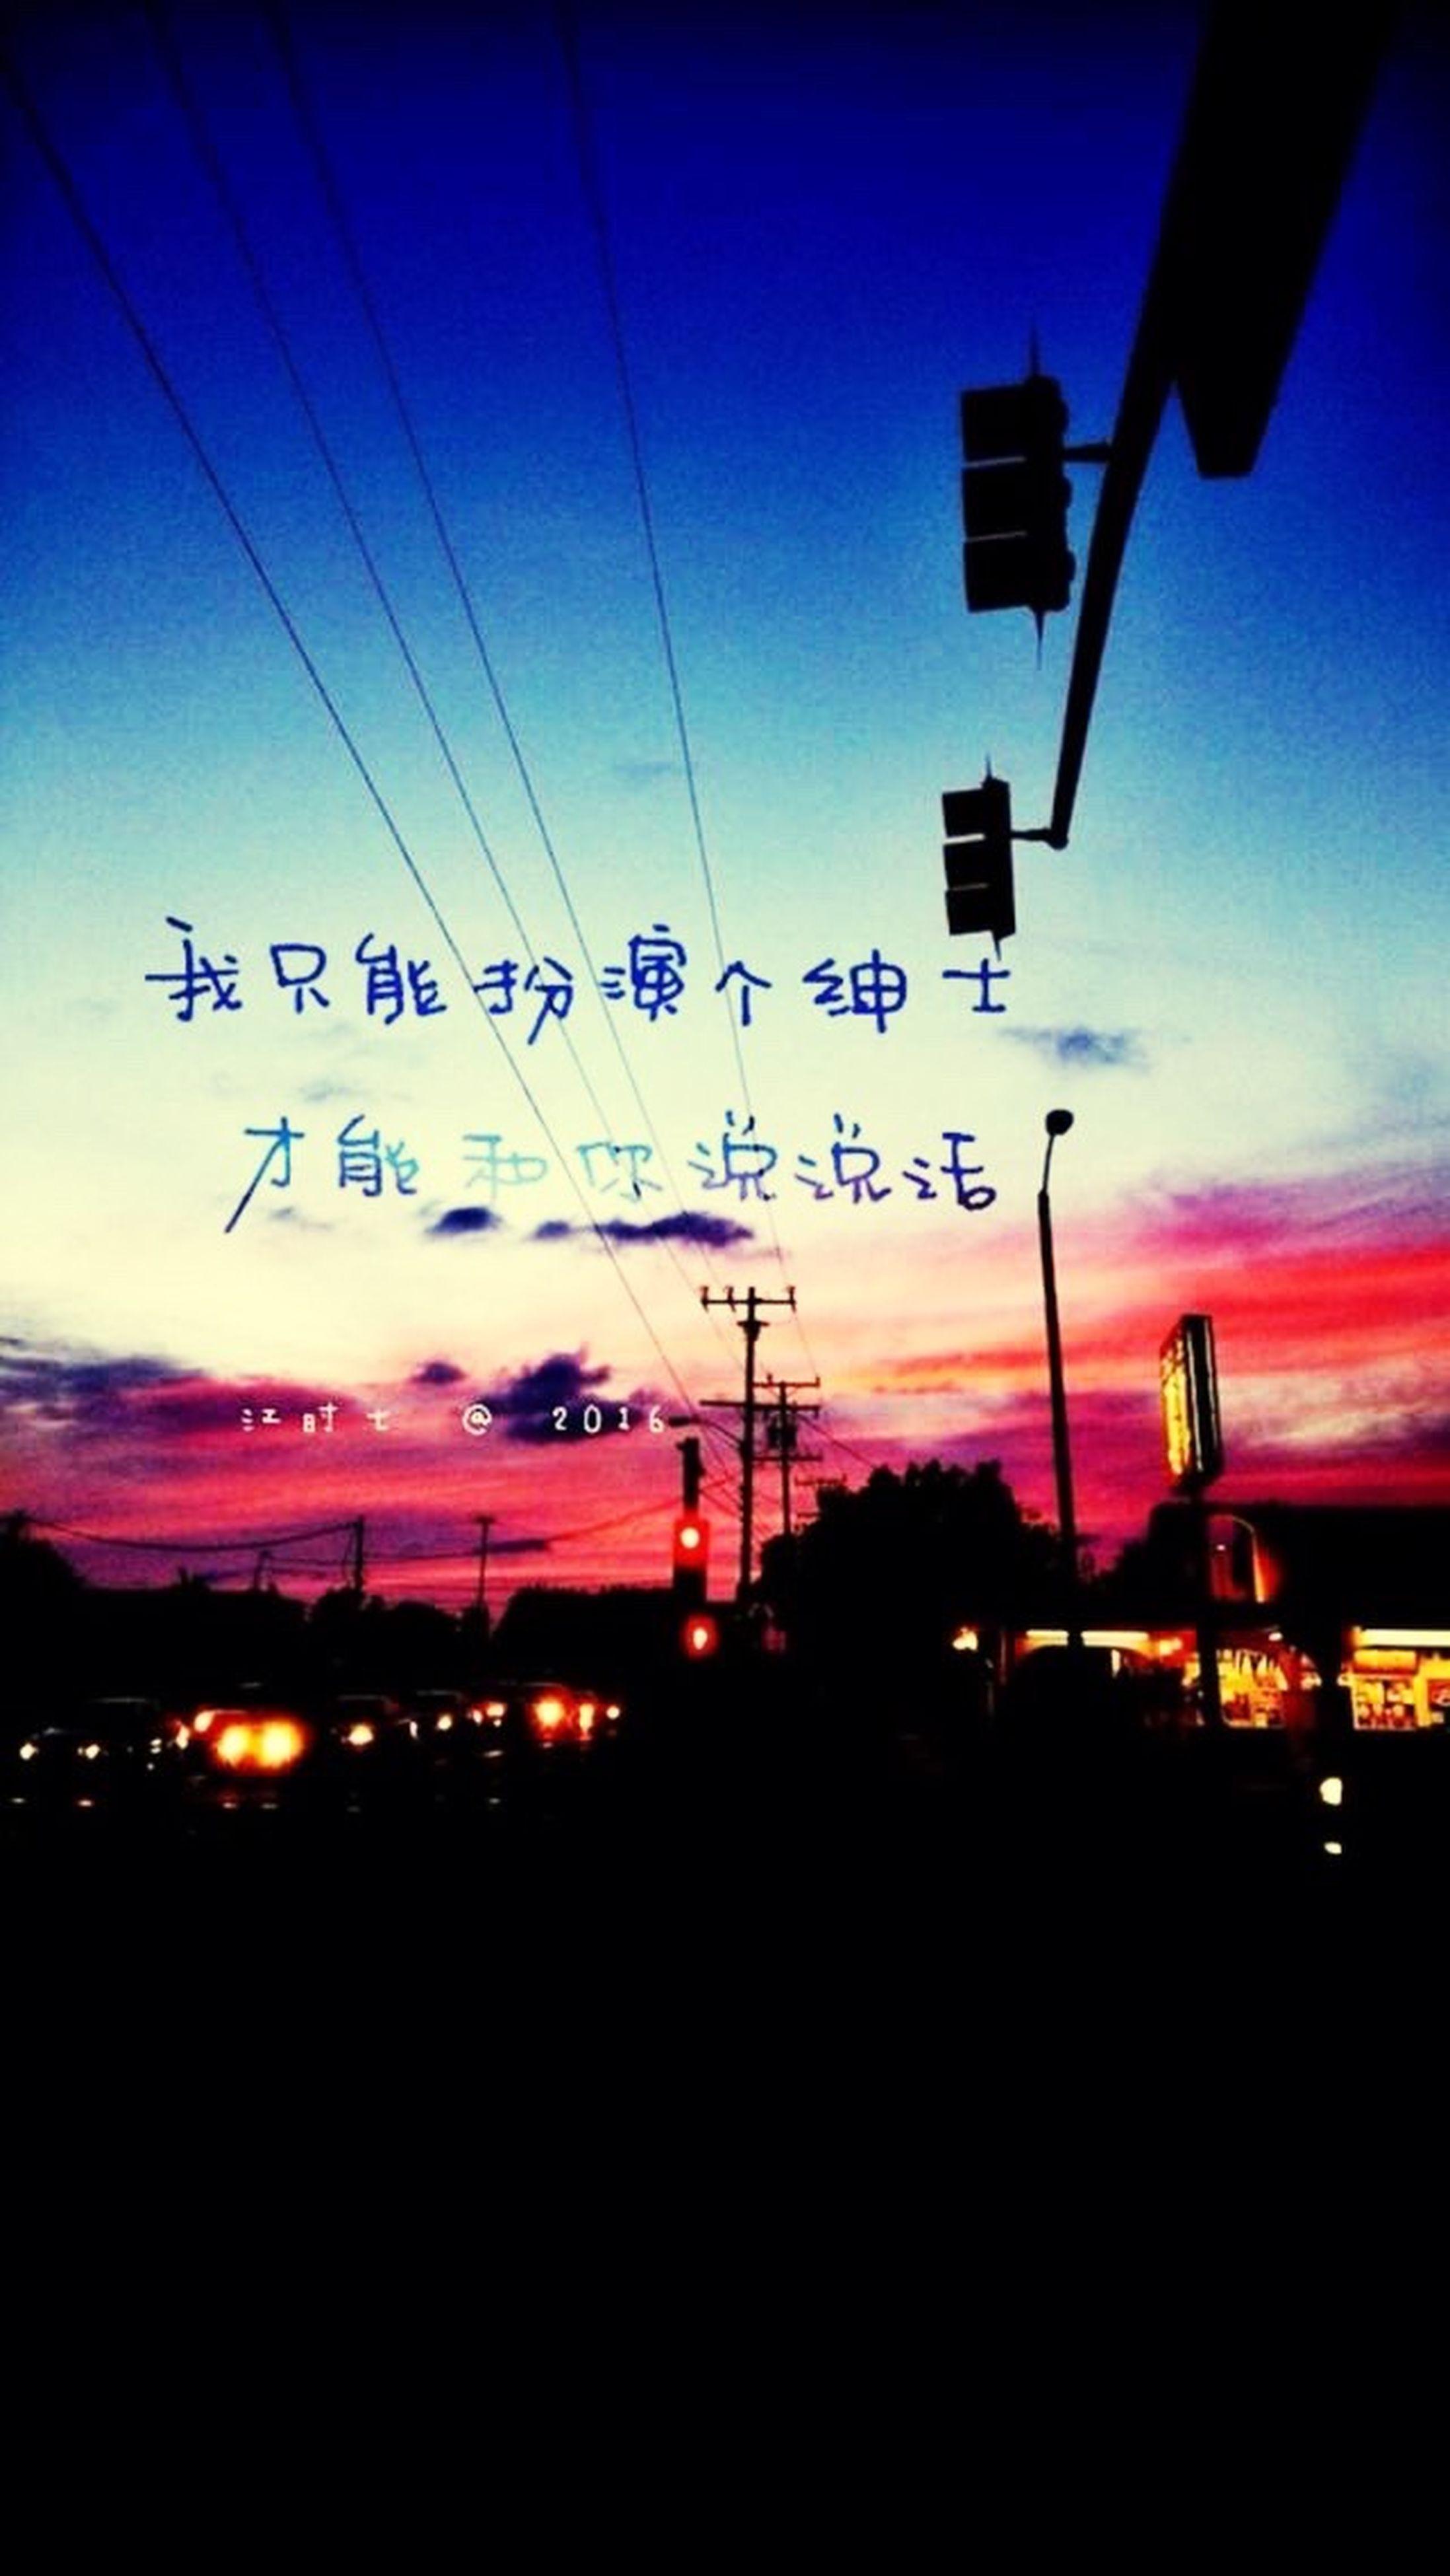 illuminated, sunset, sky, dusk, night, lighting equipment, city, blue, outdoors, no people, city life, cable, dark